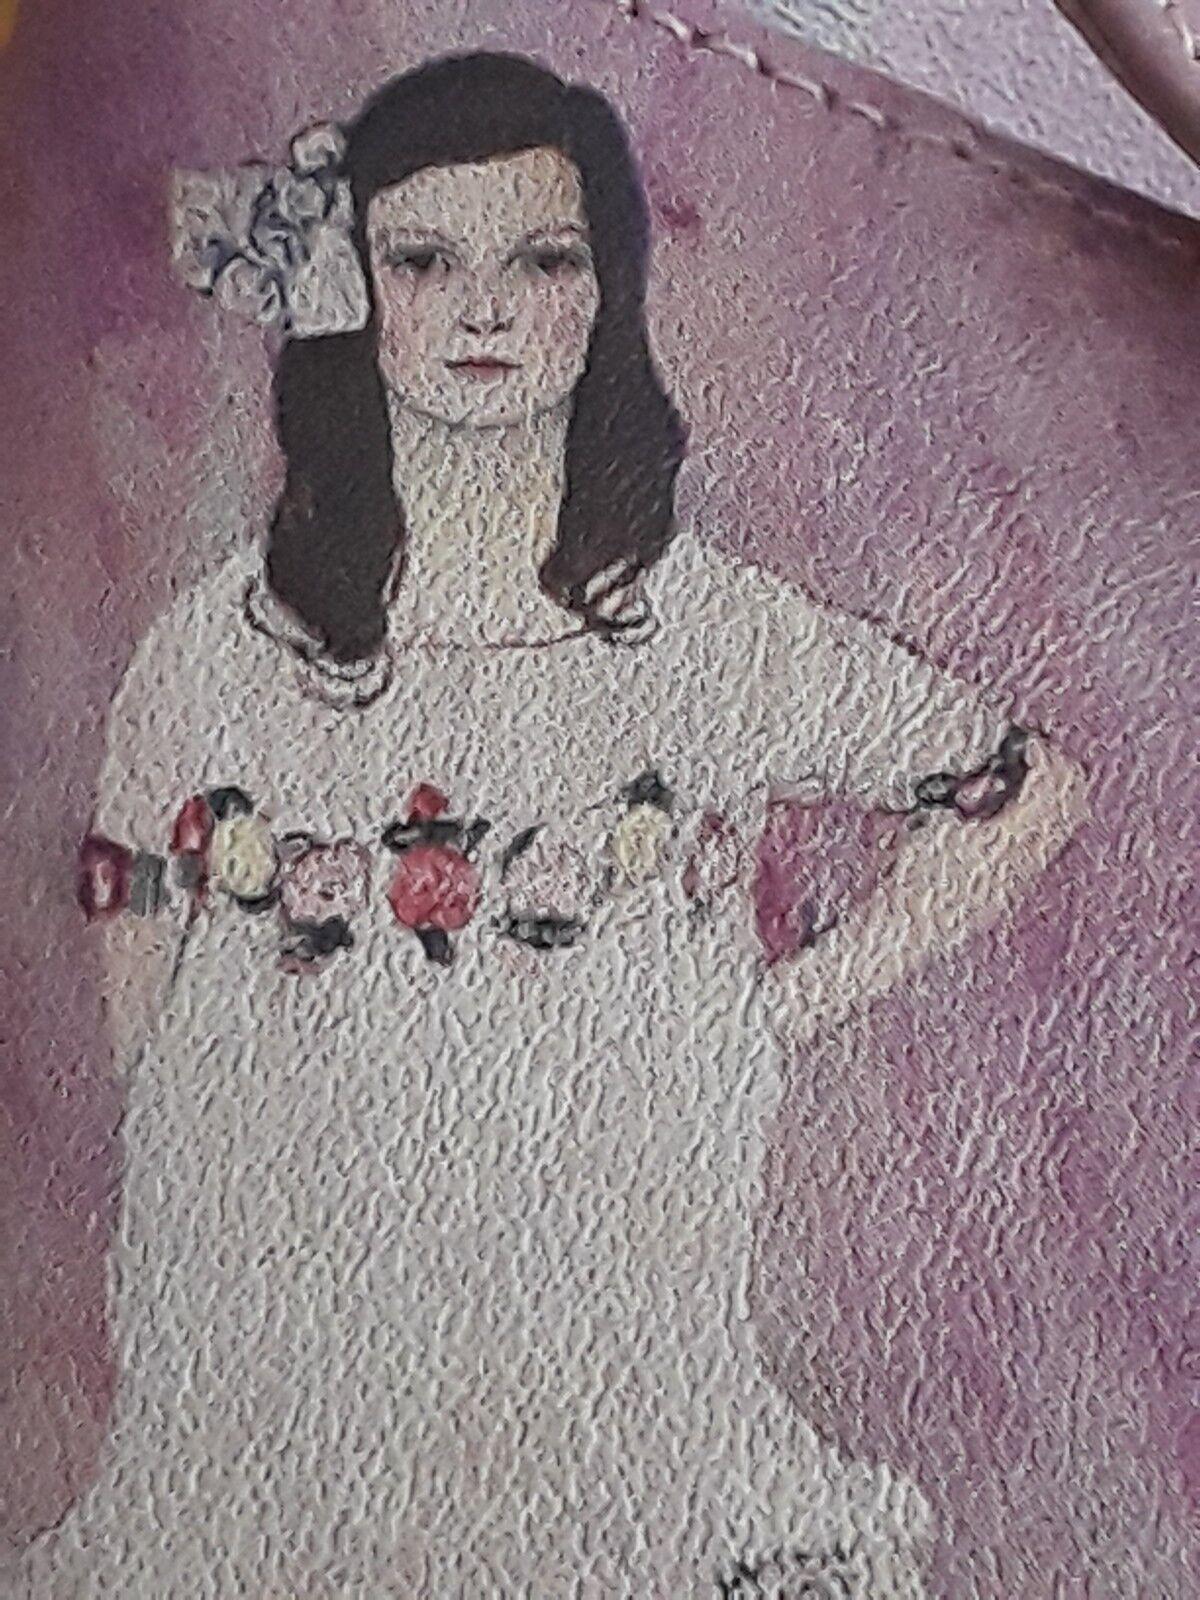 di moda NEW ICON GUSTAV KLIMT rosa LEATHER BOWS PLATFORM SLIP ON ON ON MULES SANDALS 11 scarpe  prezzi equi